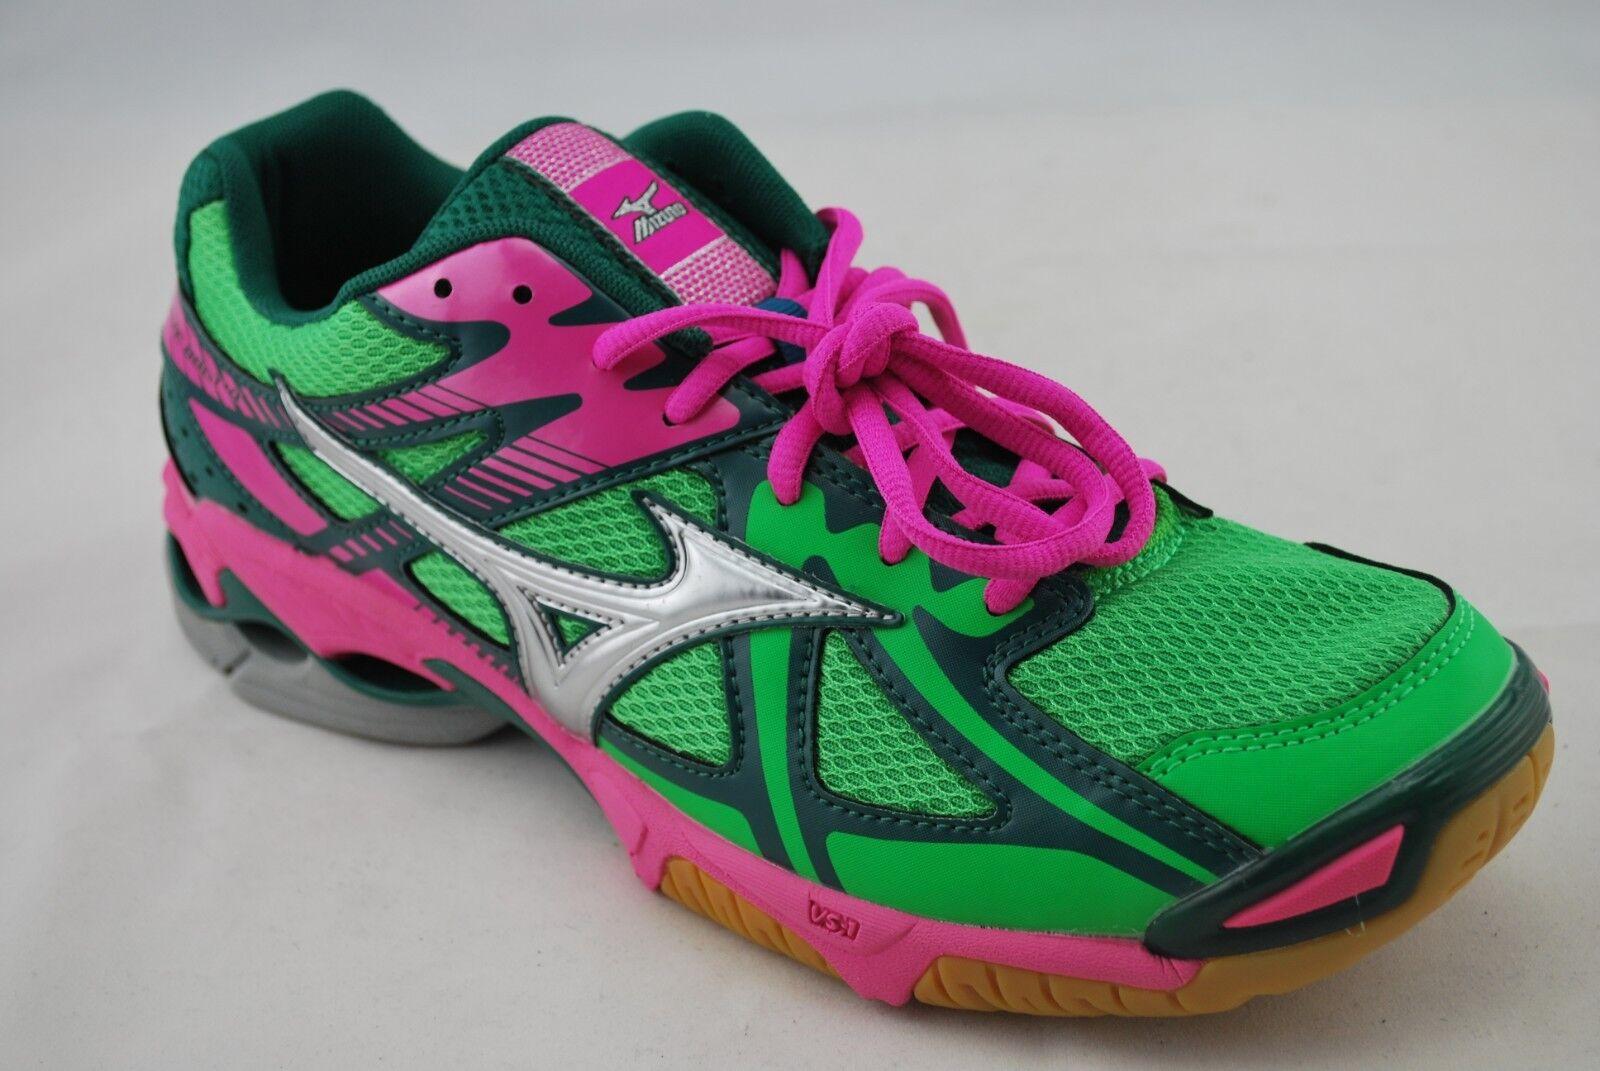 Mizuno Wave Bolt 4 Indoor Hallenschuh Non-Marking Damen Gr.42 Gr.42 Gr.42 d92714